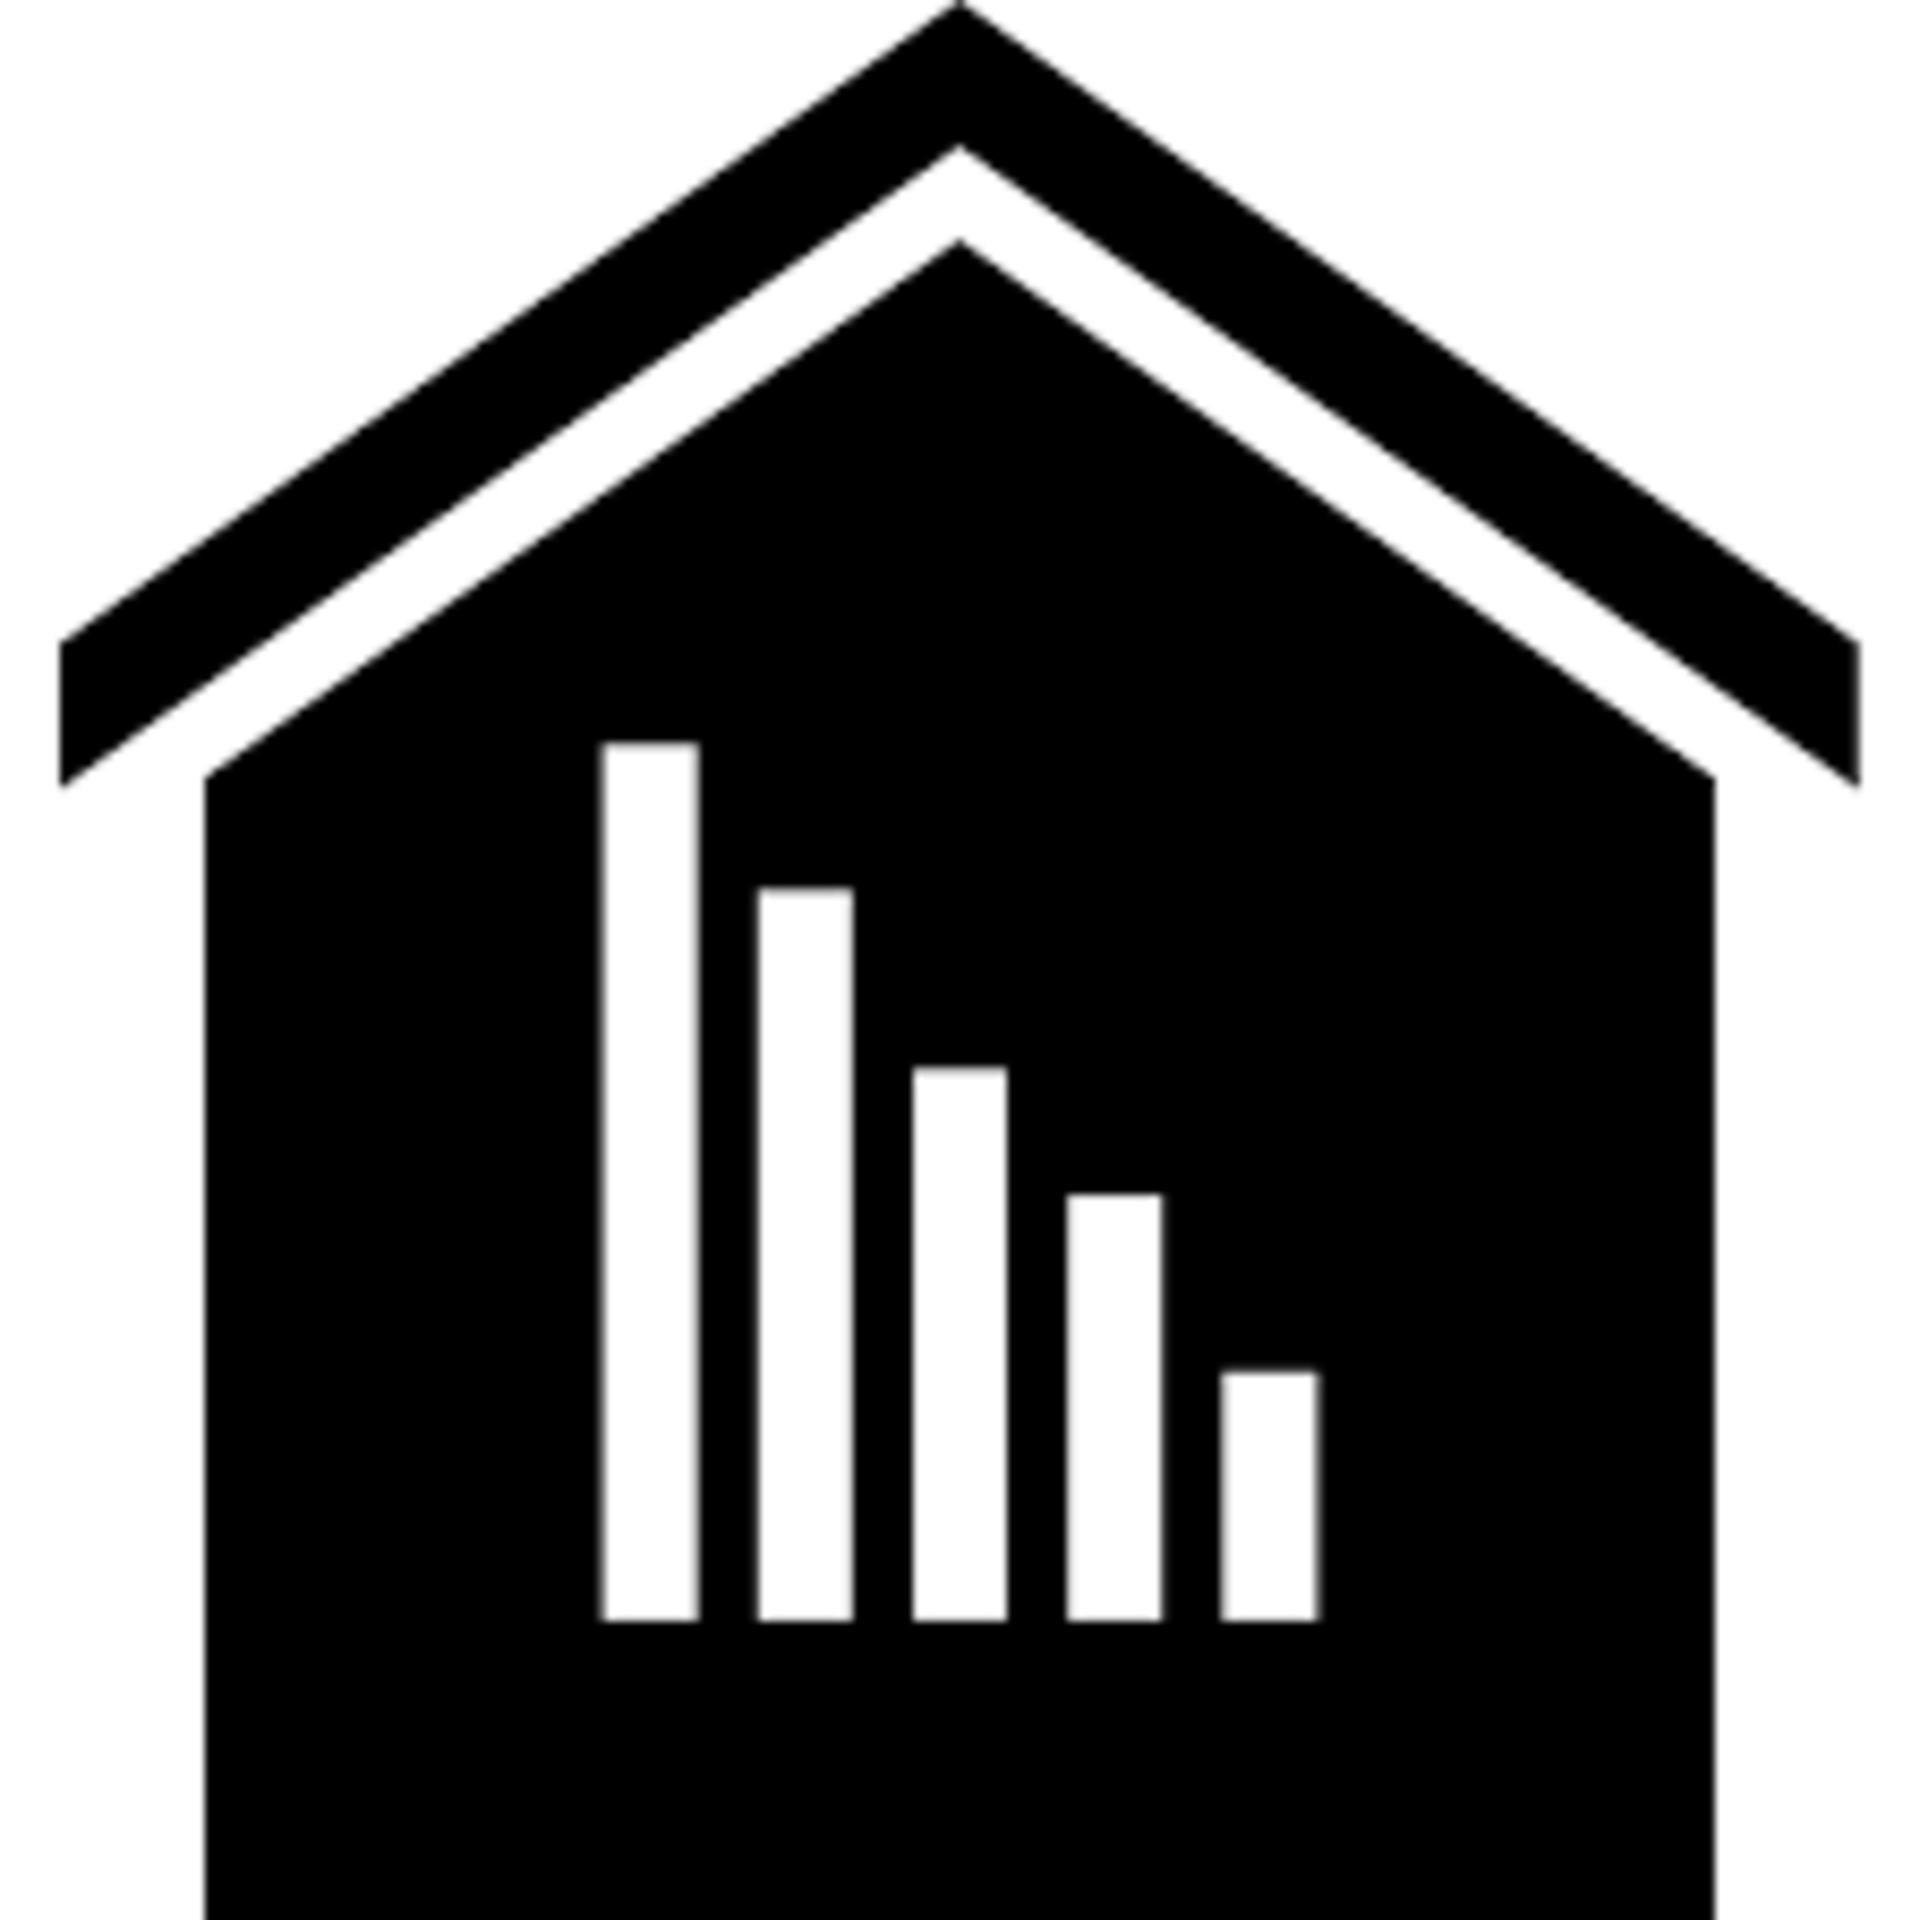 Mission Viejo 2018 Real Estate Recap